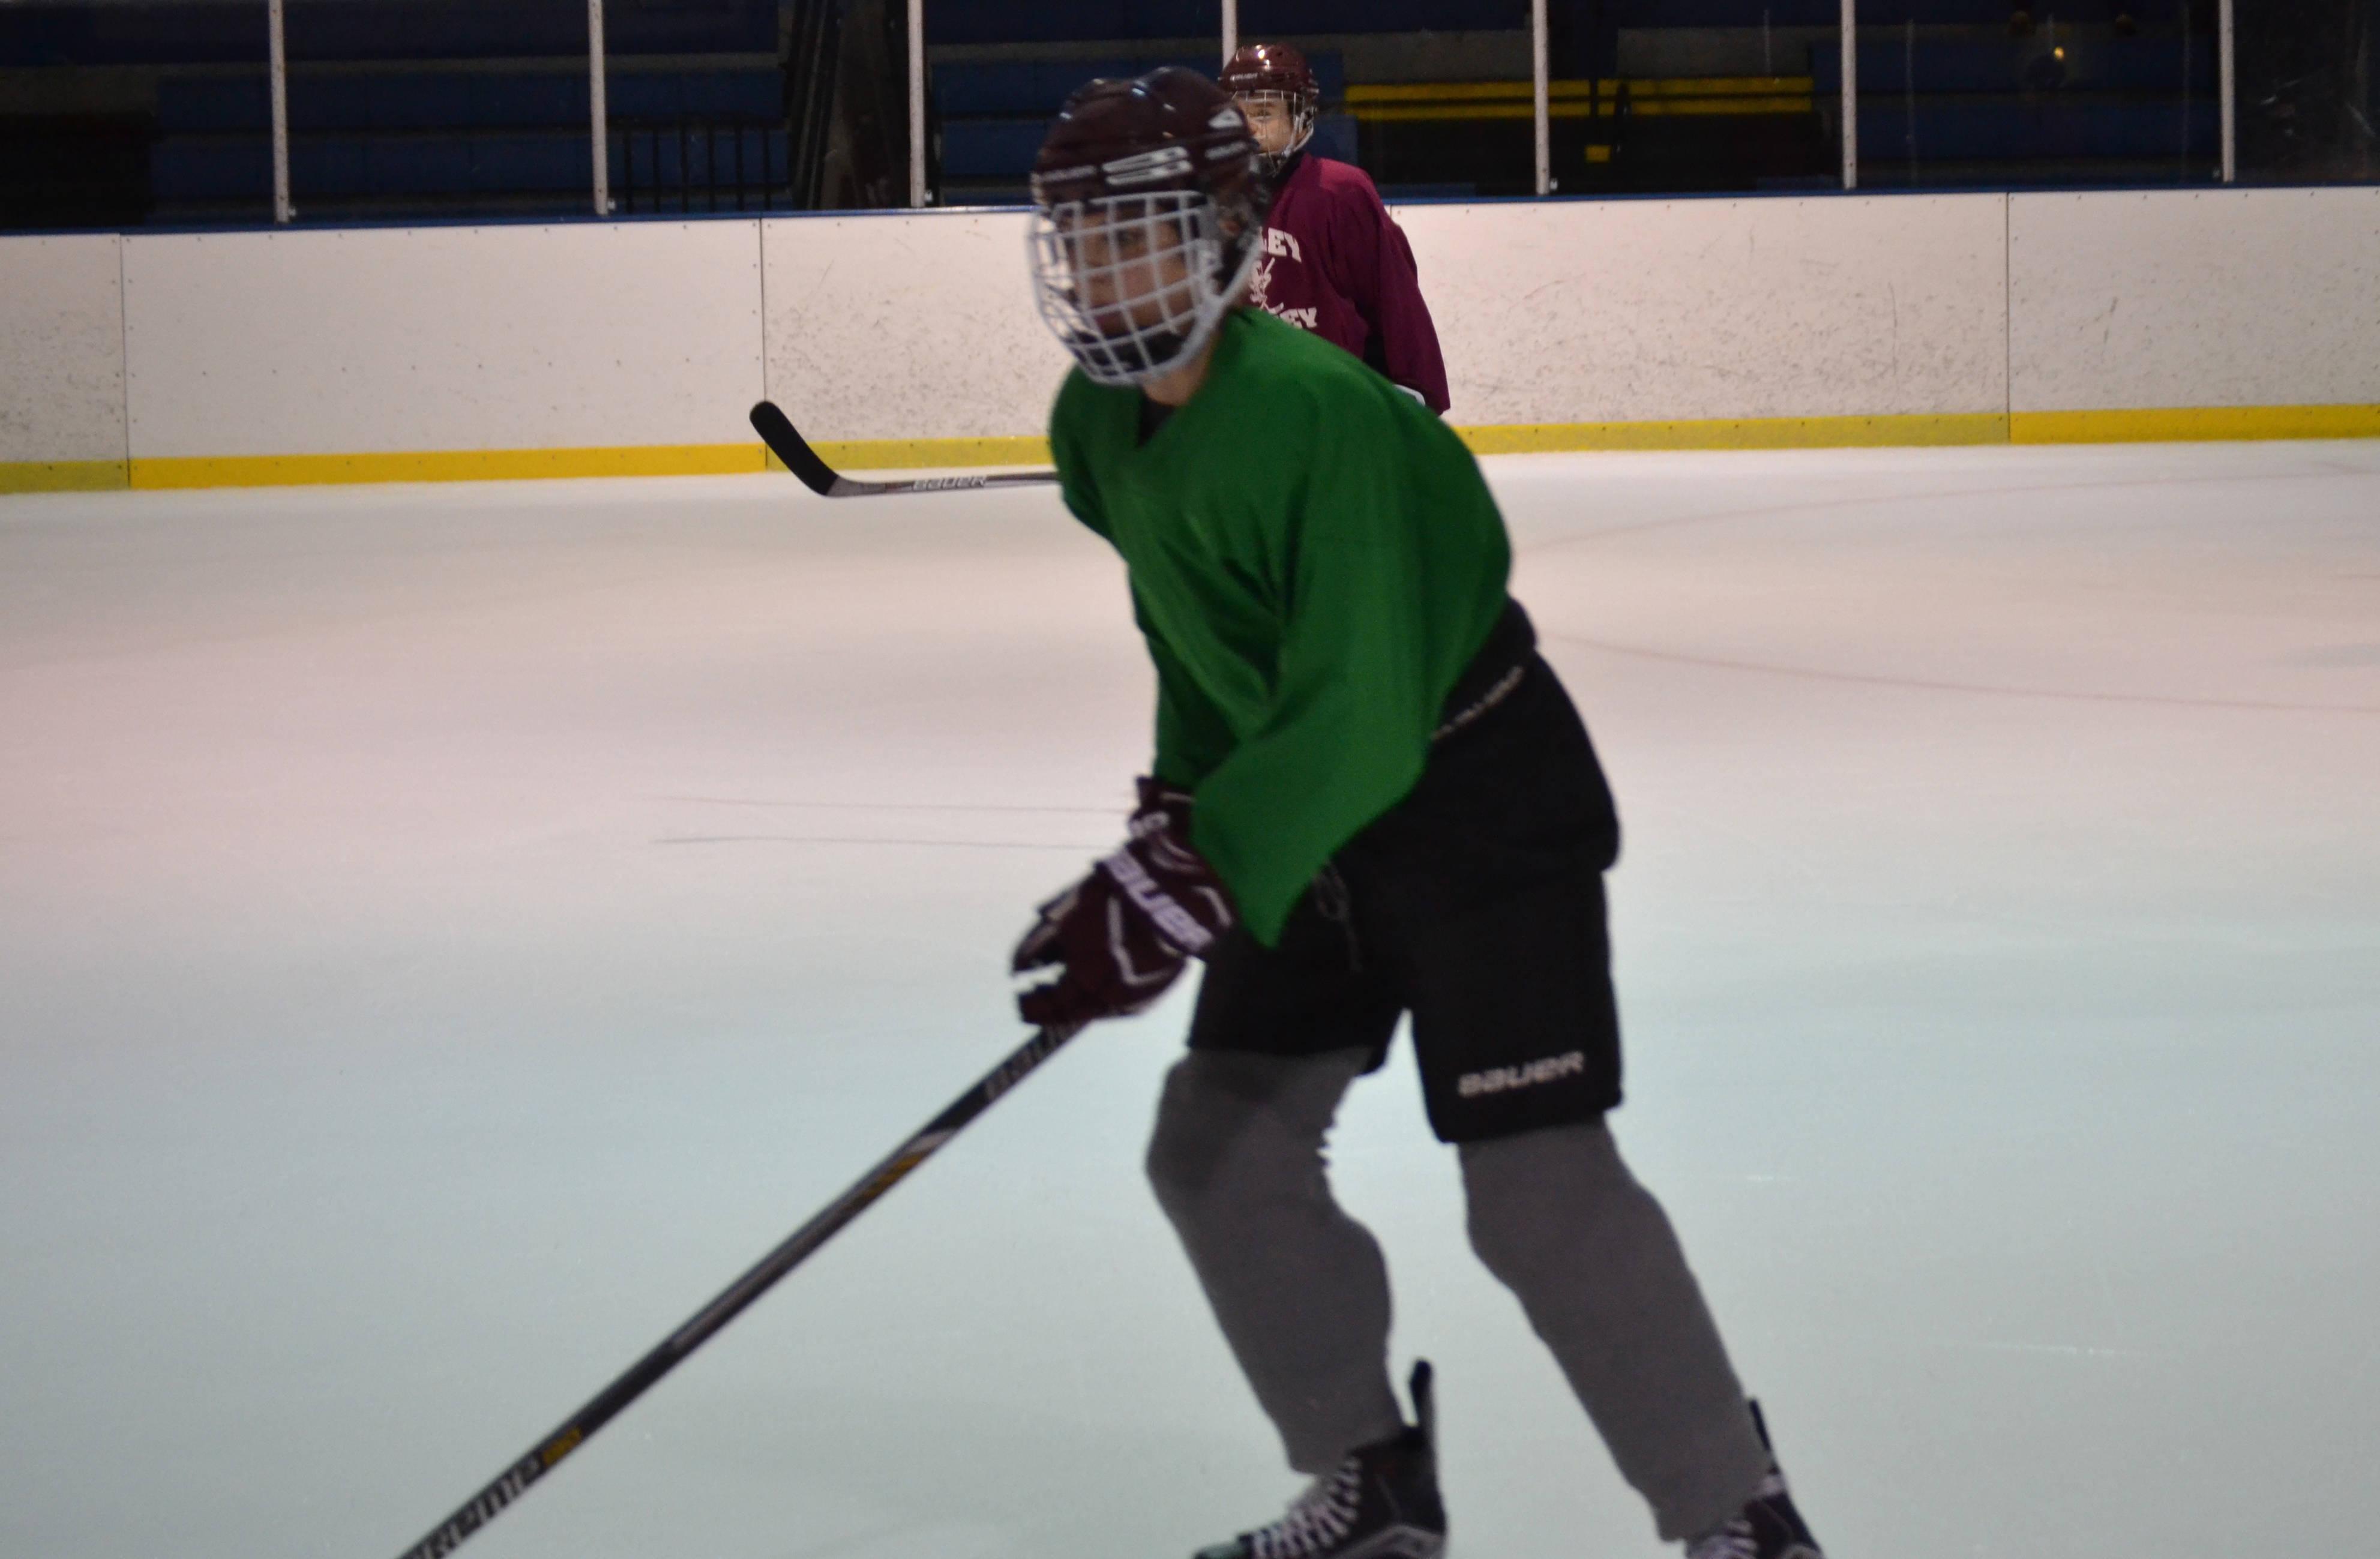 1e2ea22c4bb34d22429f_hockey5.jpg